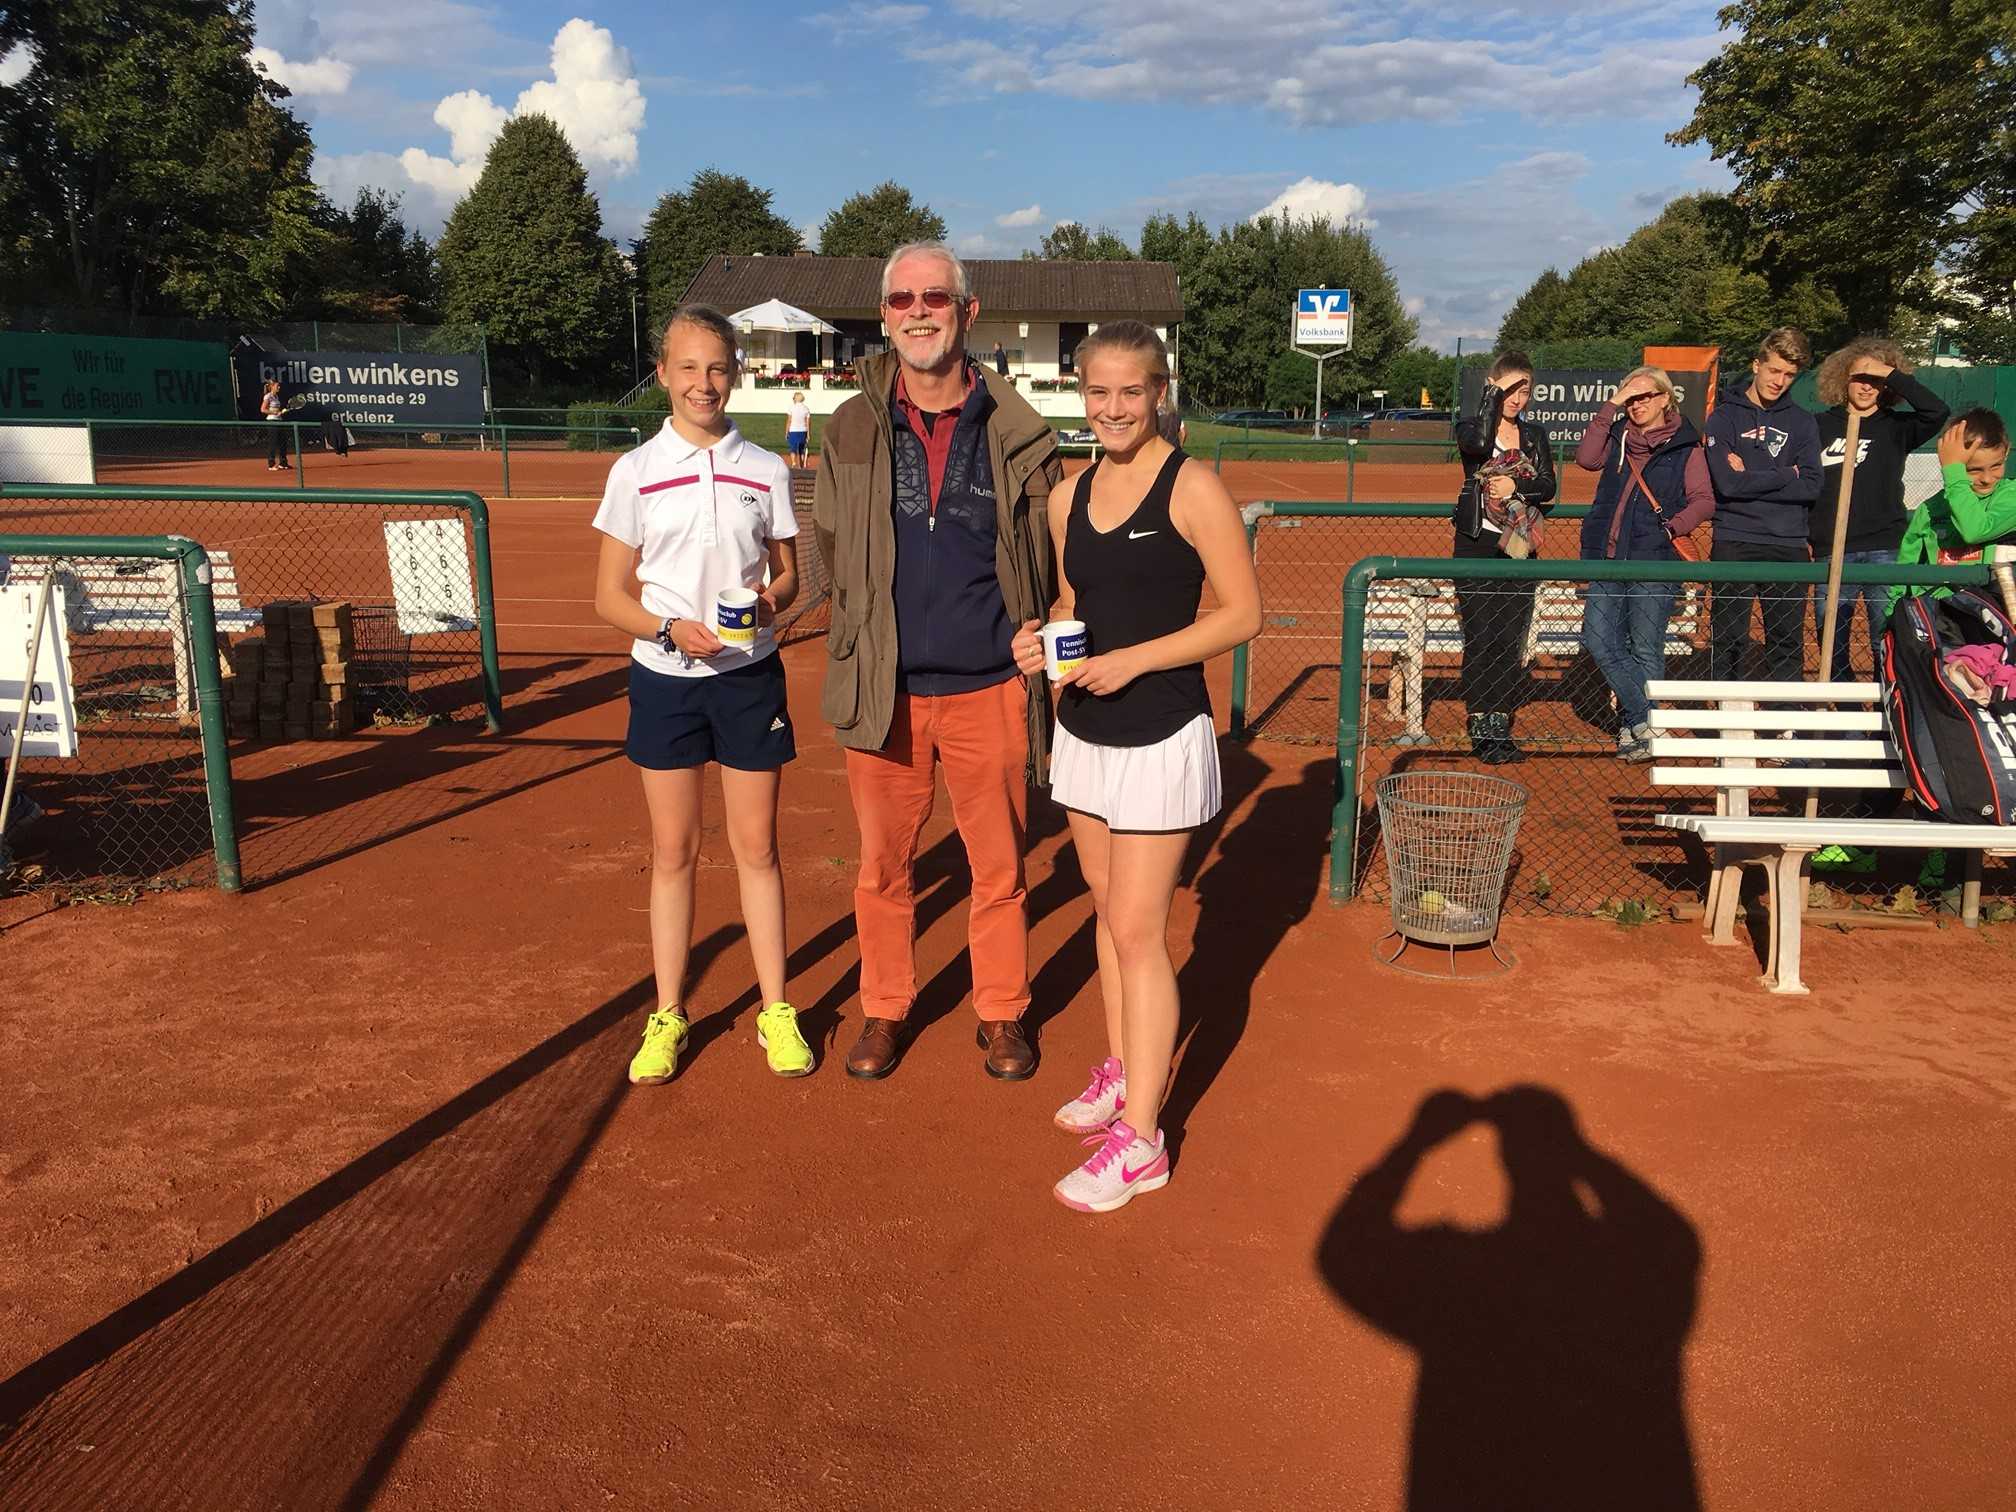 v.l. Julia Kiwit, Rüdiger Röttger, Lea Bregenhorn